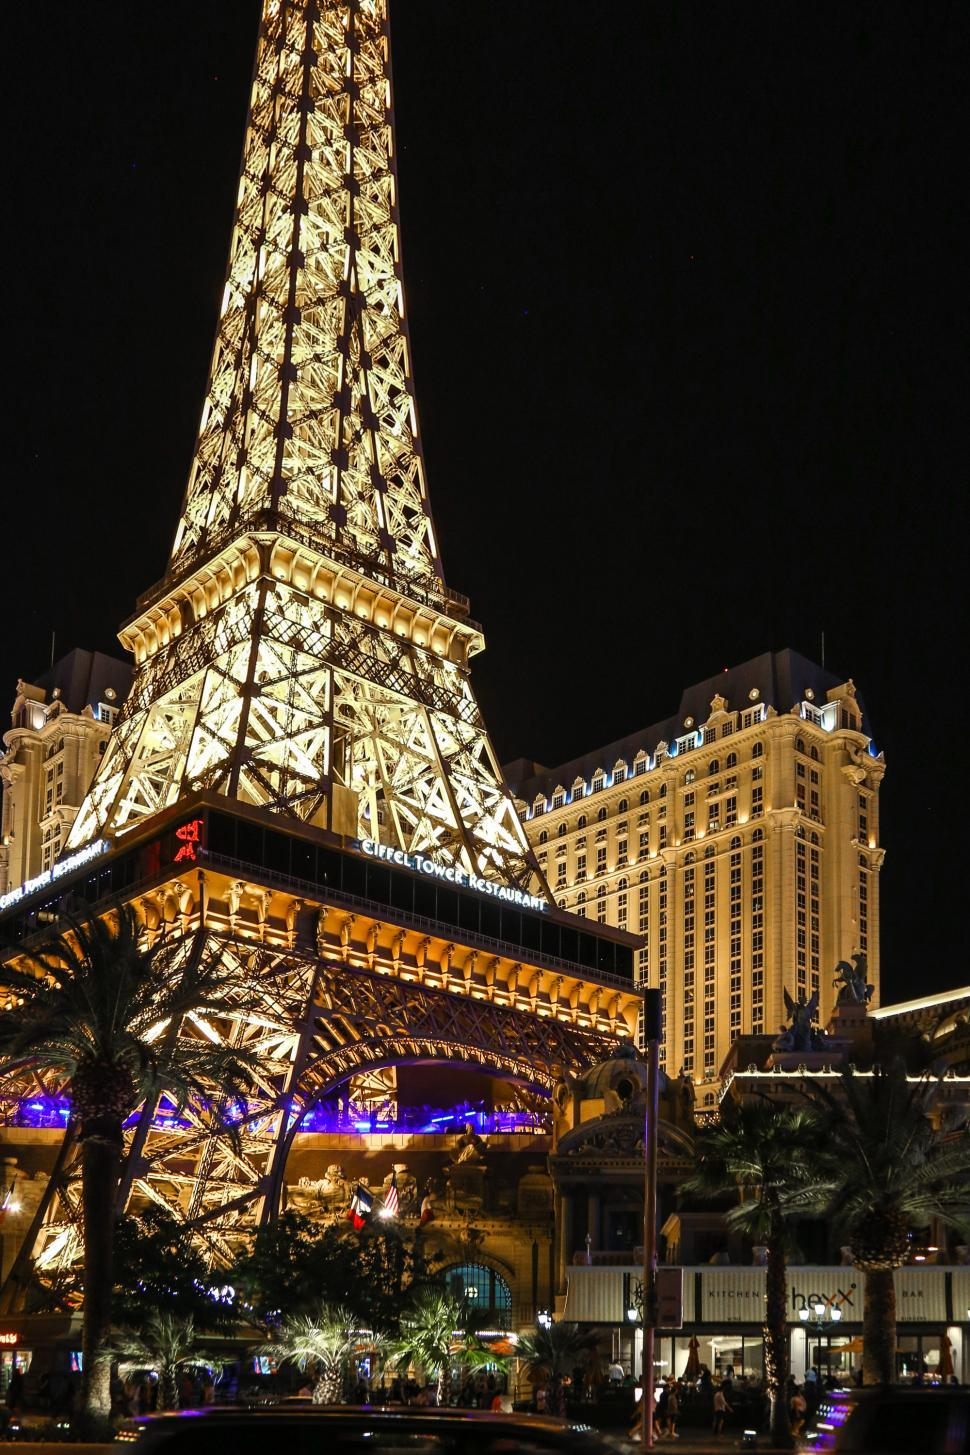 Download Free Stock HD Photo of Eiffel Tower Restaurant in Las Vegas Online